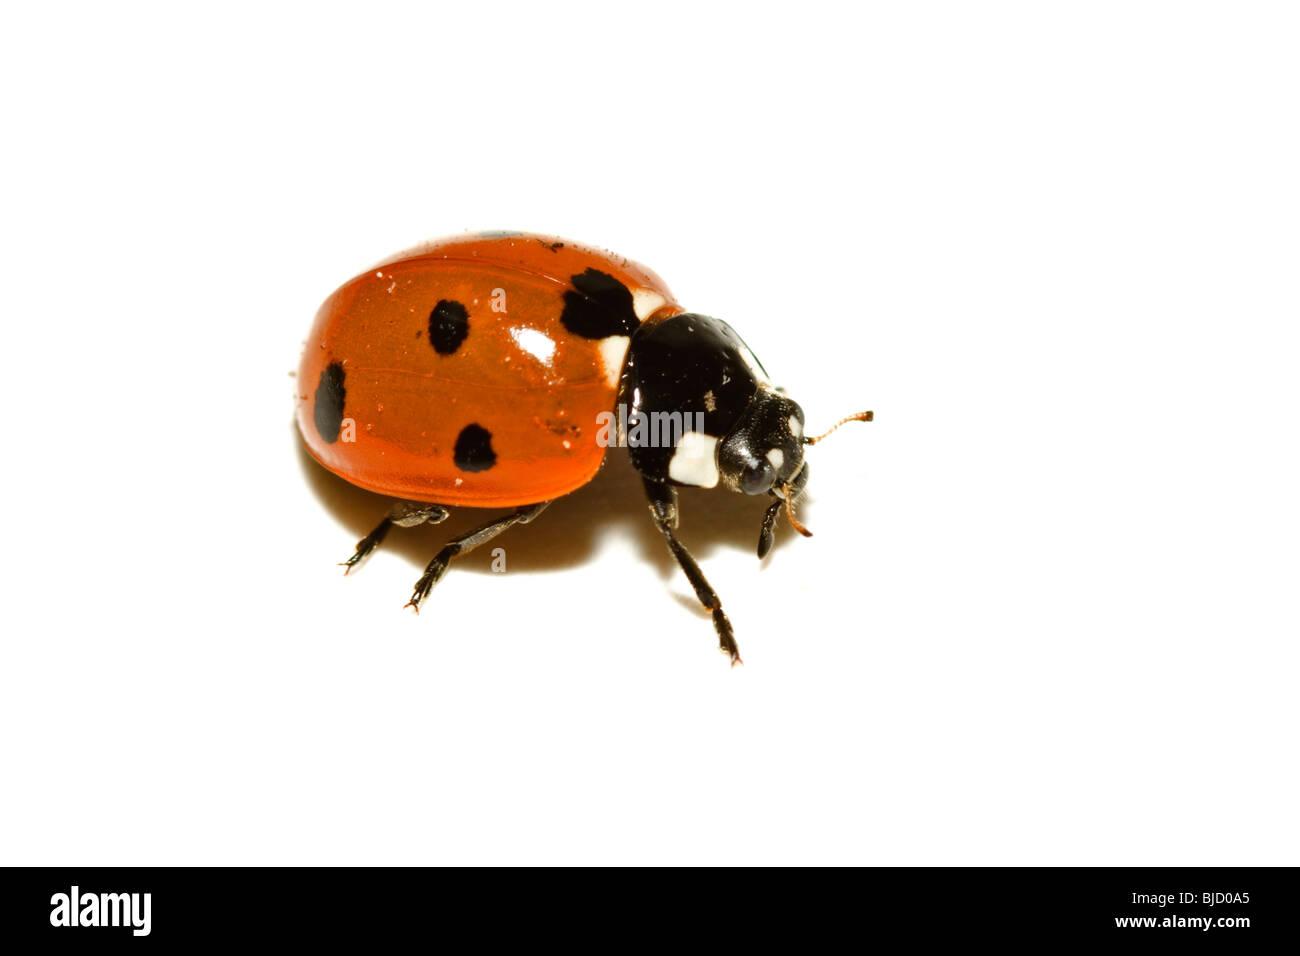 Seven spot ladybird, Coccinella septempunctata - Stock Image